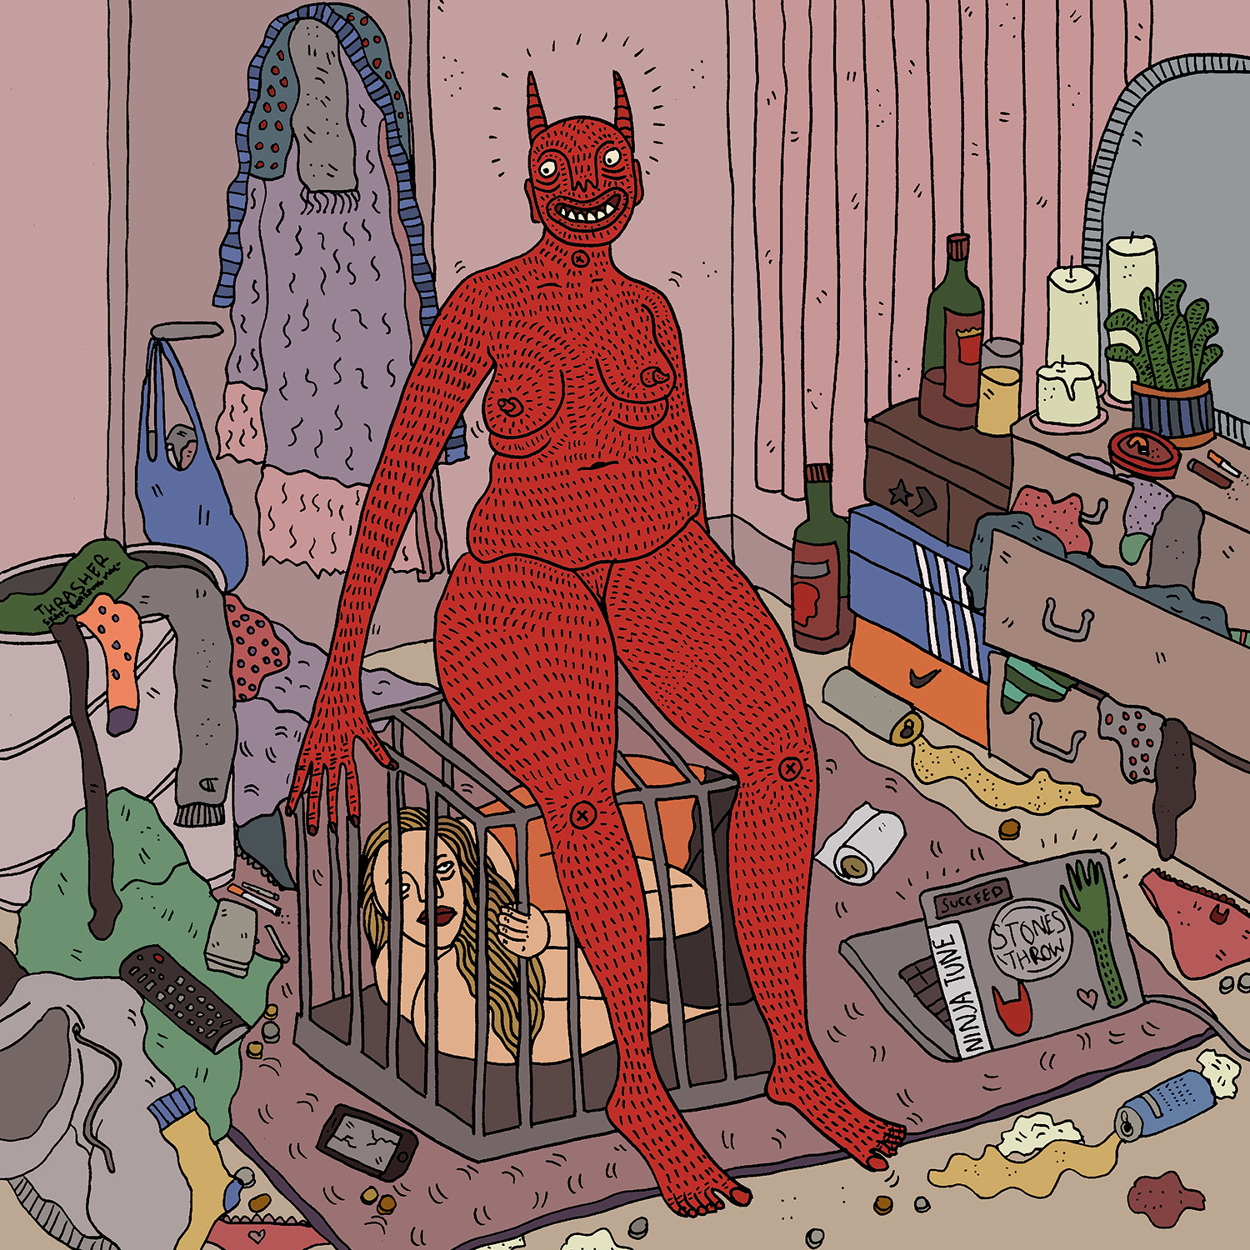 artwork-of-demons-having-sex-small-nude